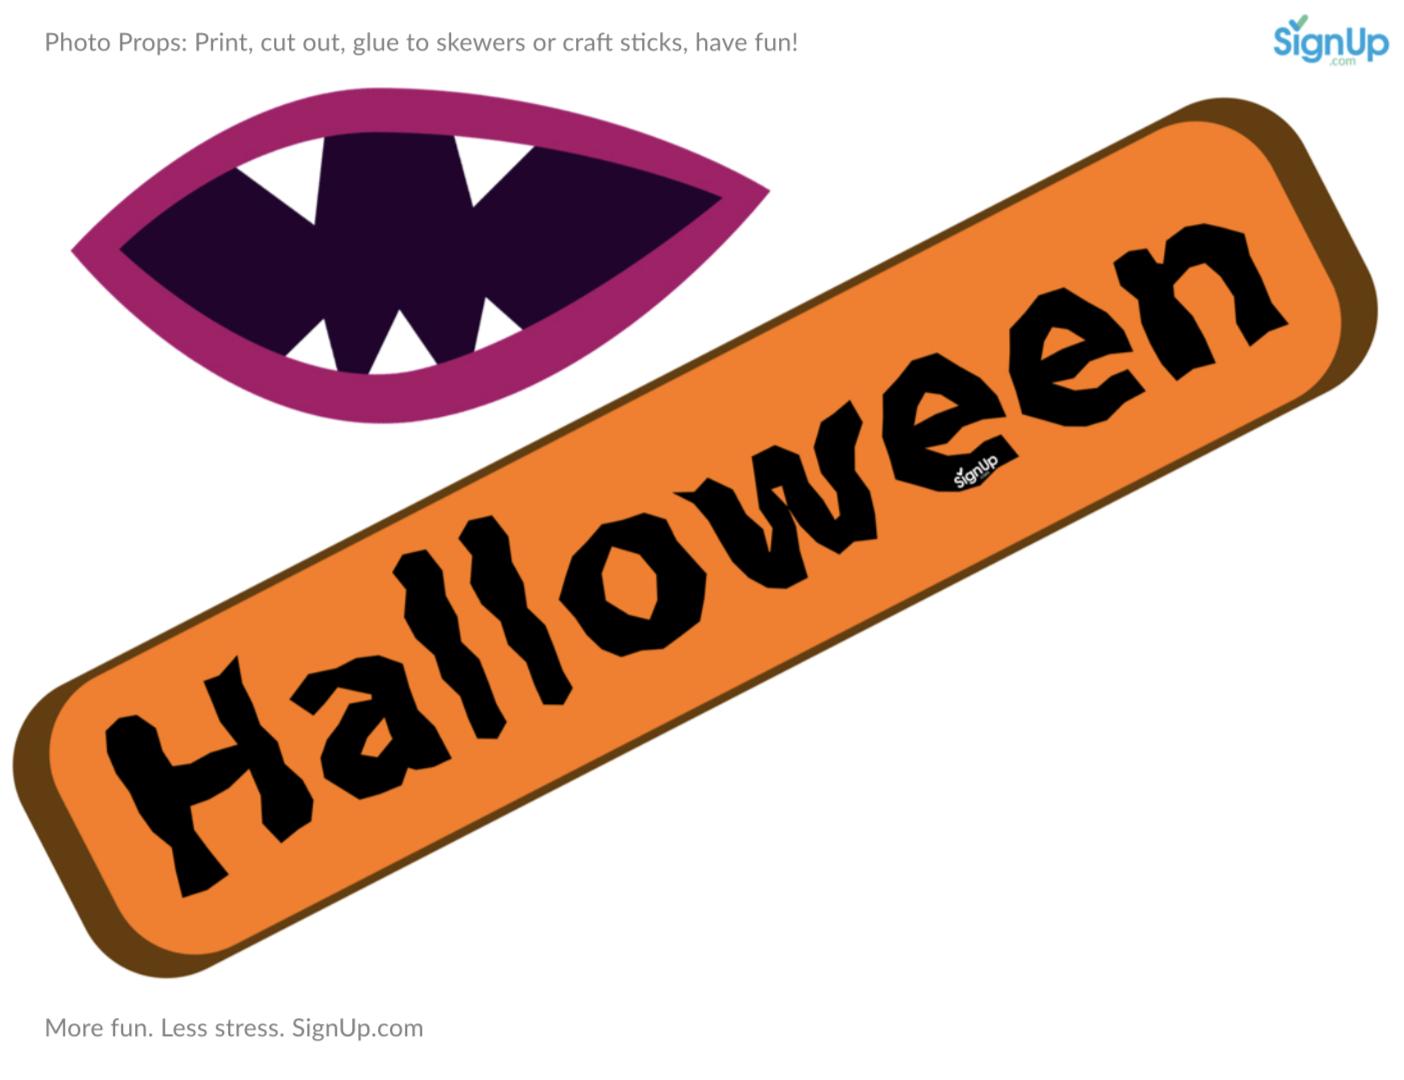 image regarding Halloween Photo Booth Props Printable identified as Printable Photobooth Props: Halloween Get together Craft Sport